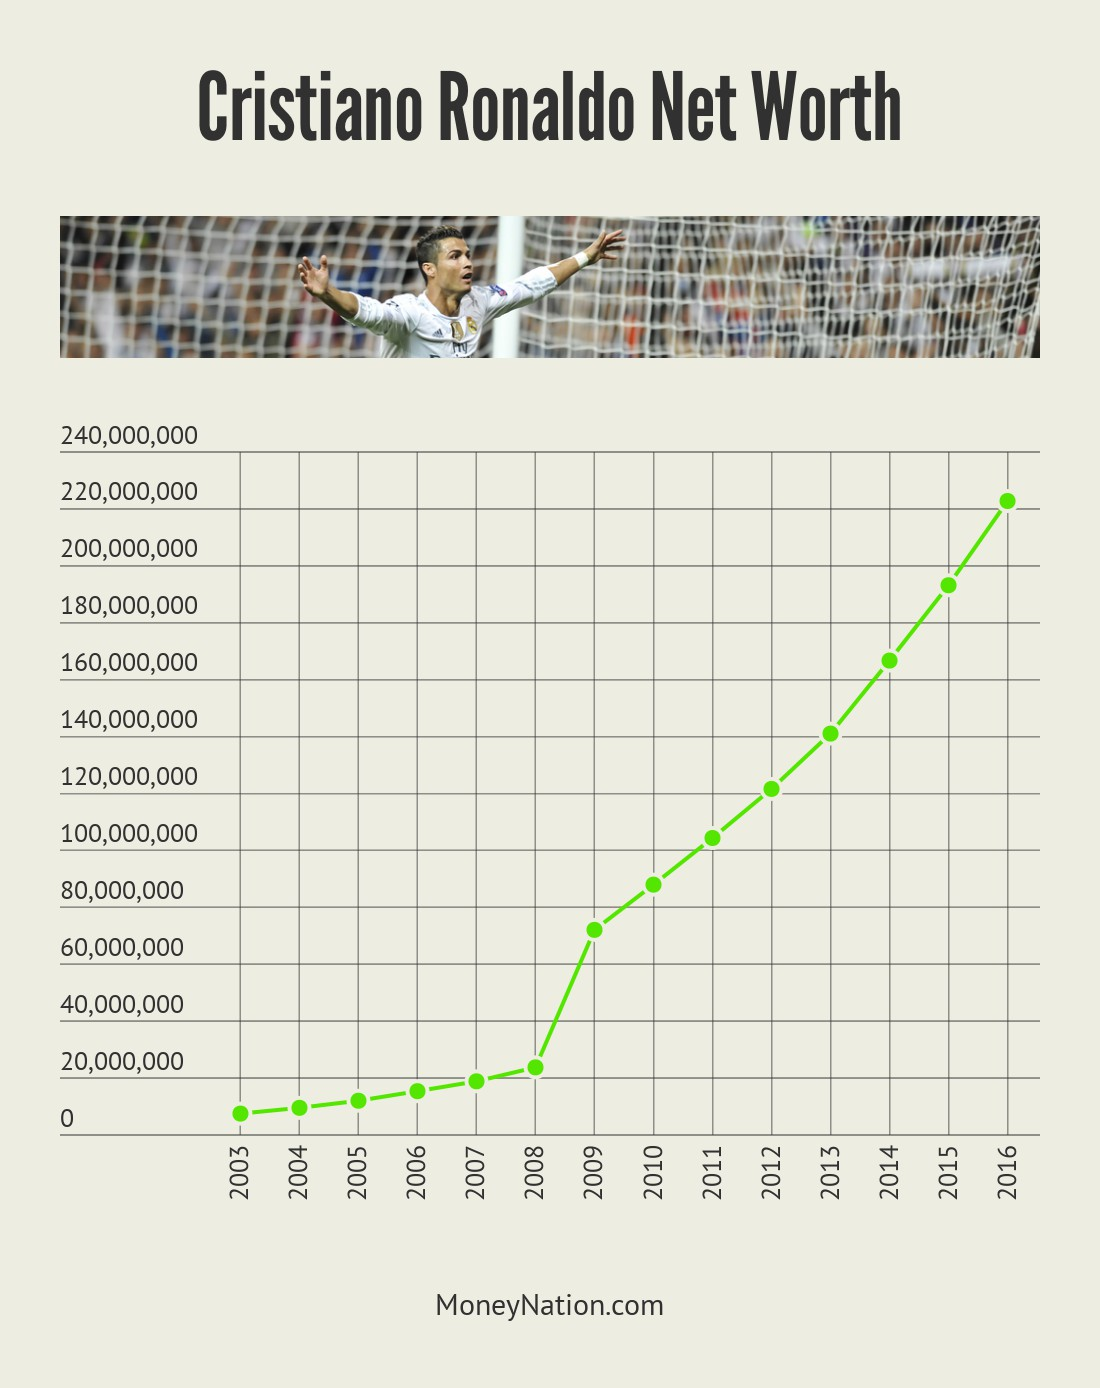 Cristiano Ronaldo Net Worth Timeline